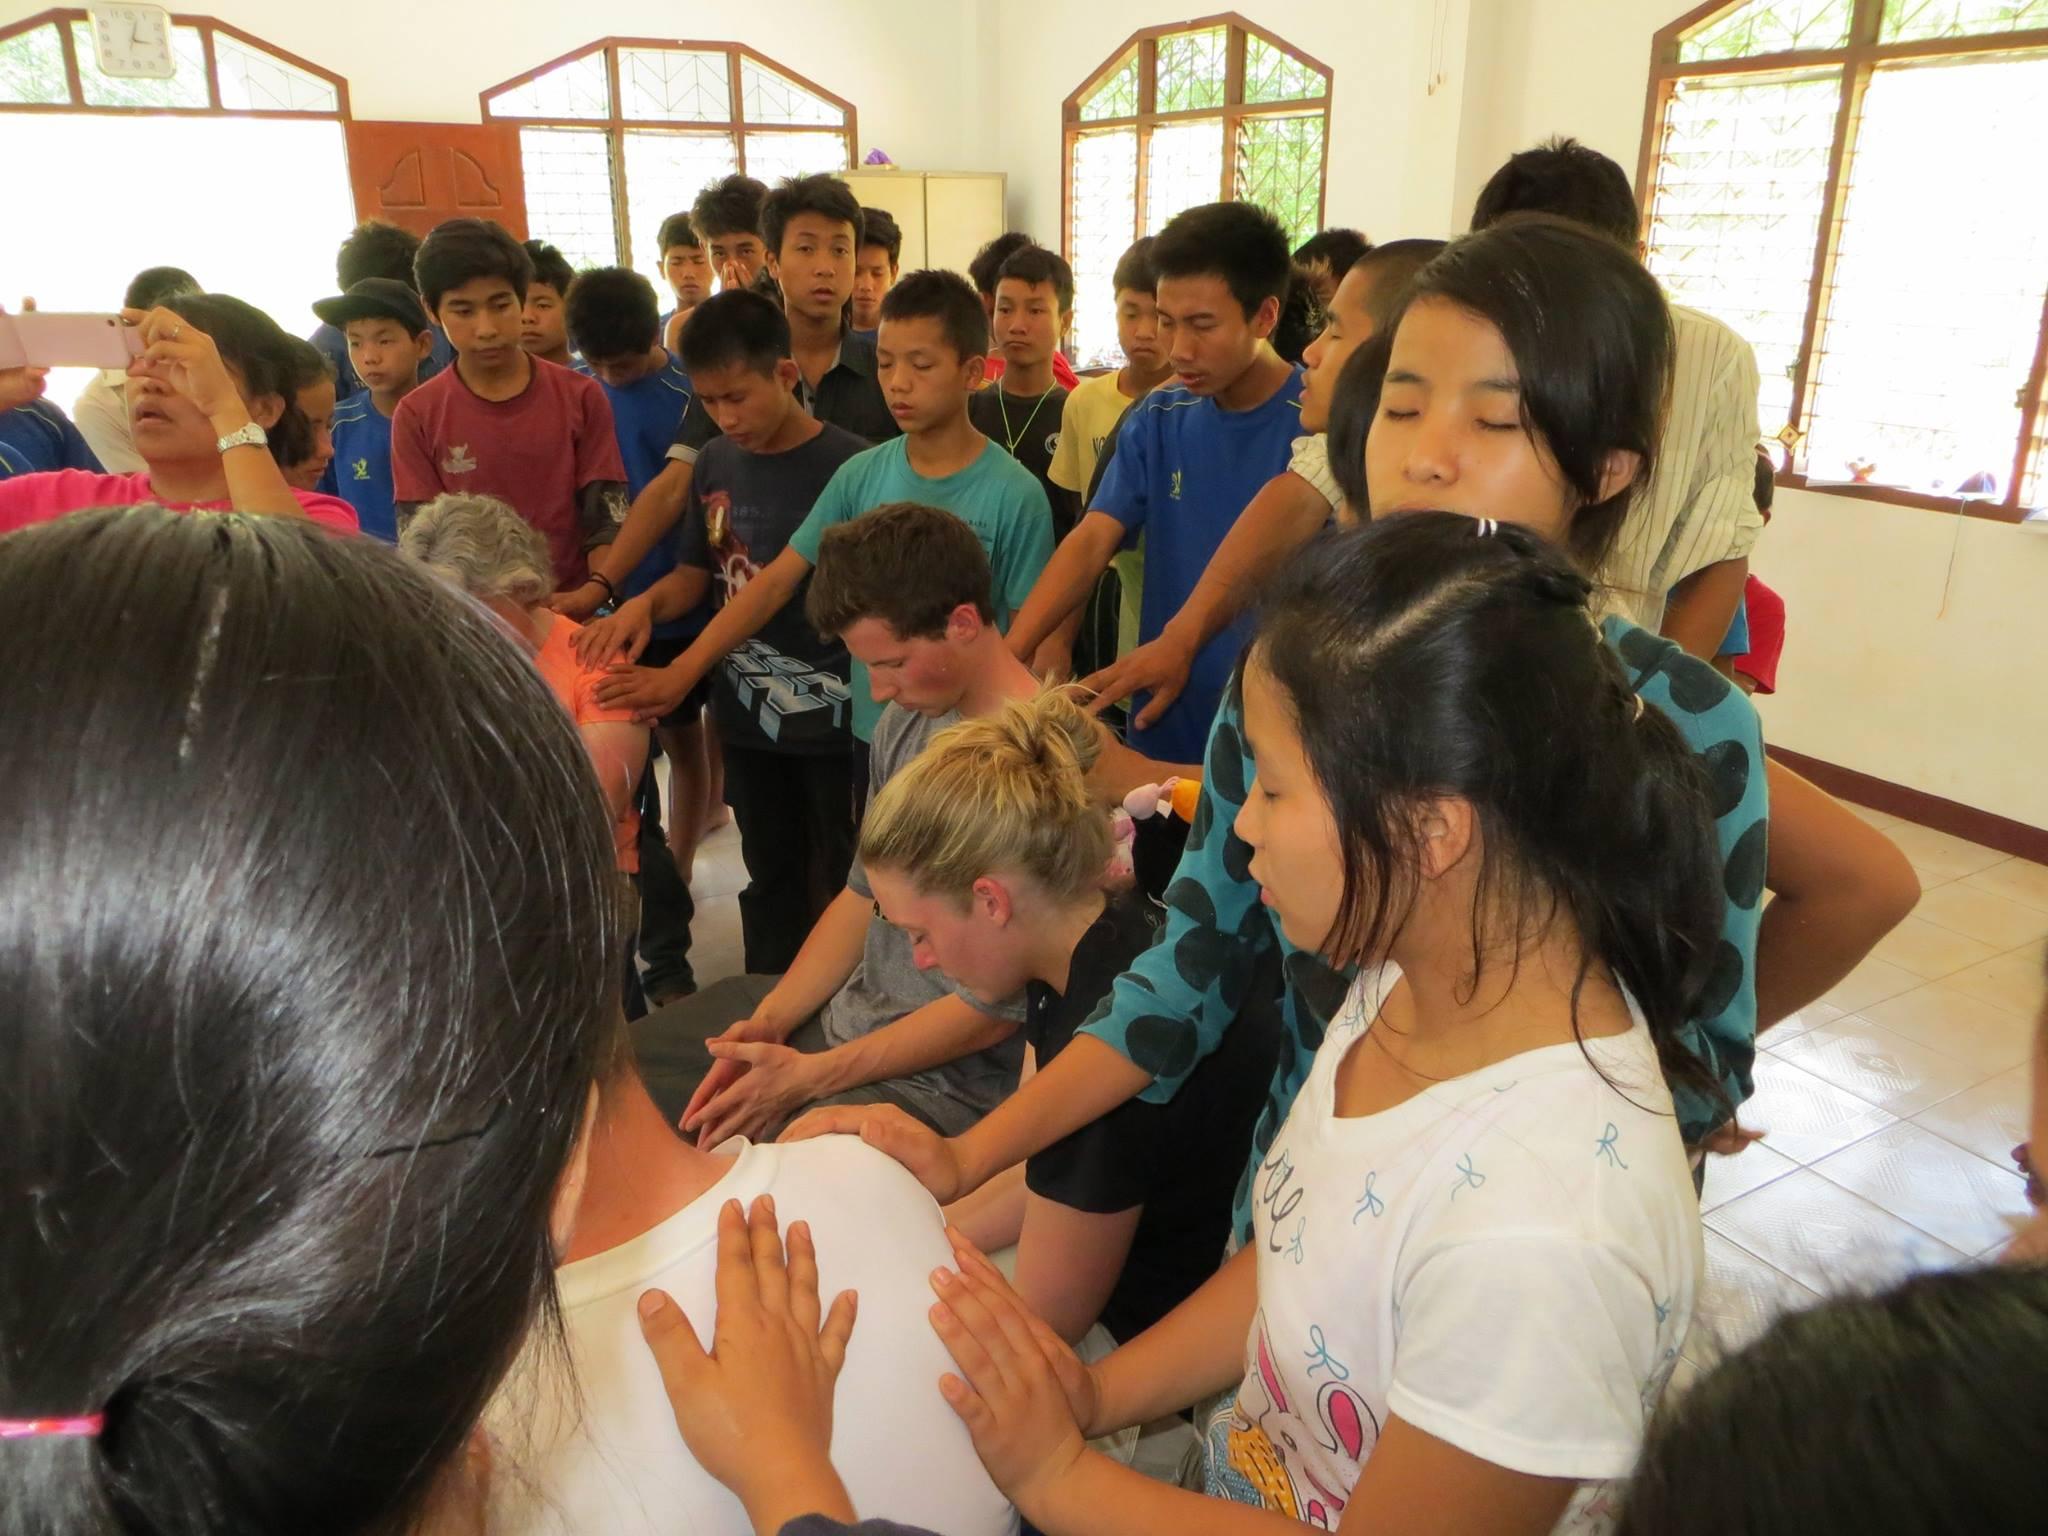 Medical missions trip report: December 2014